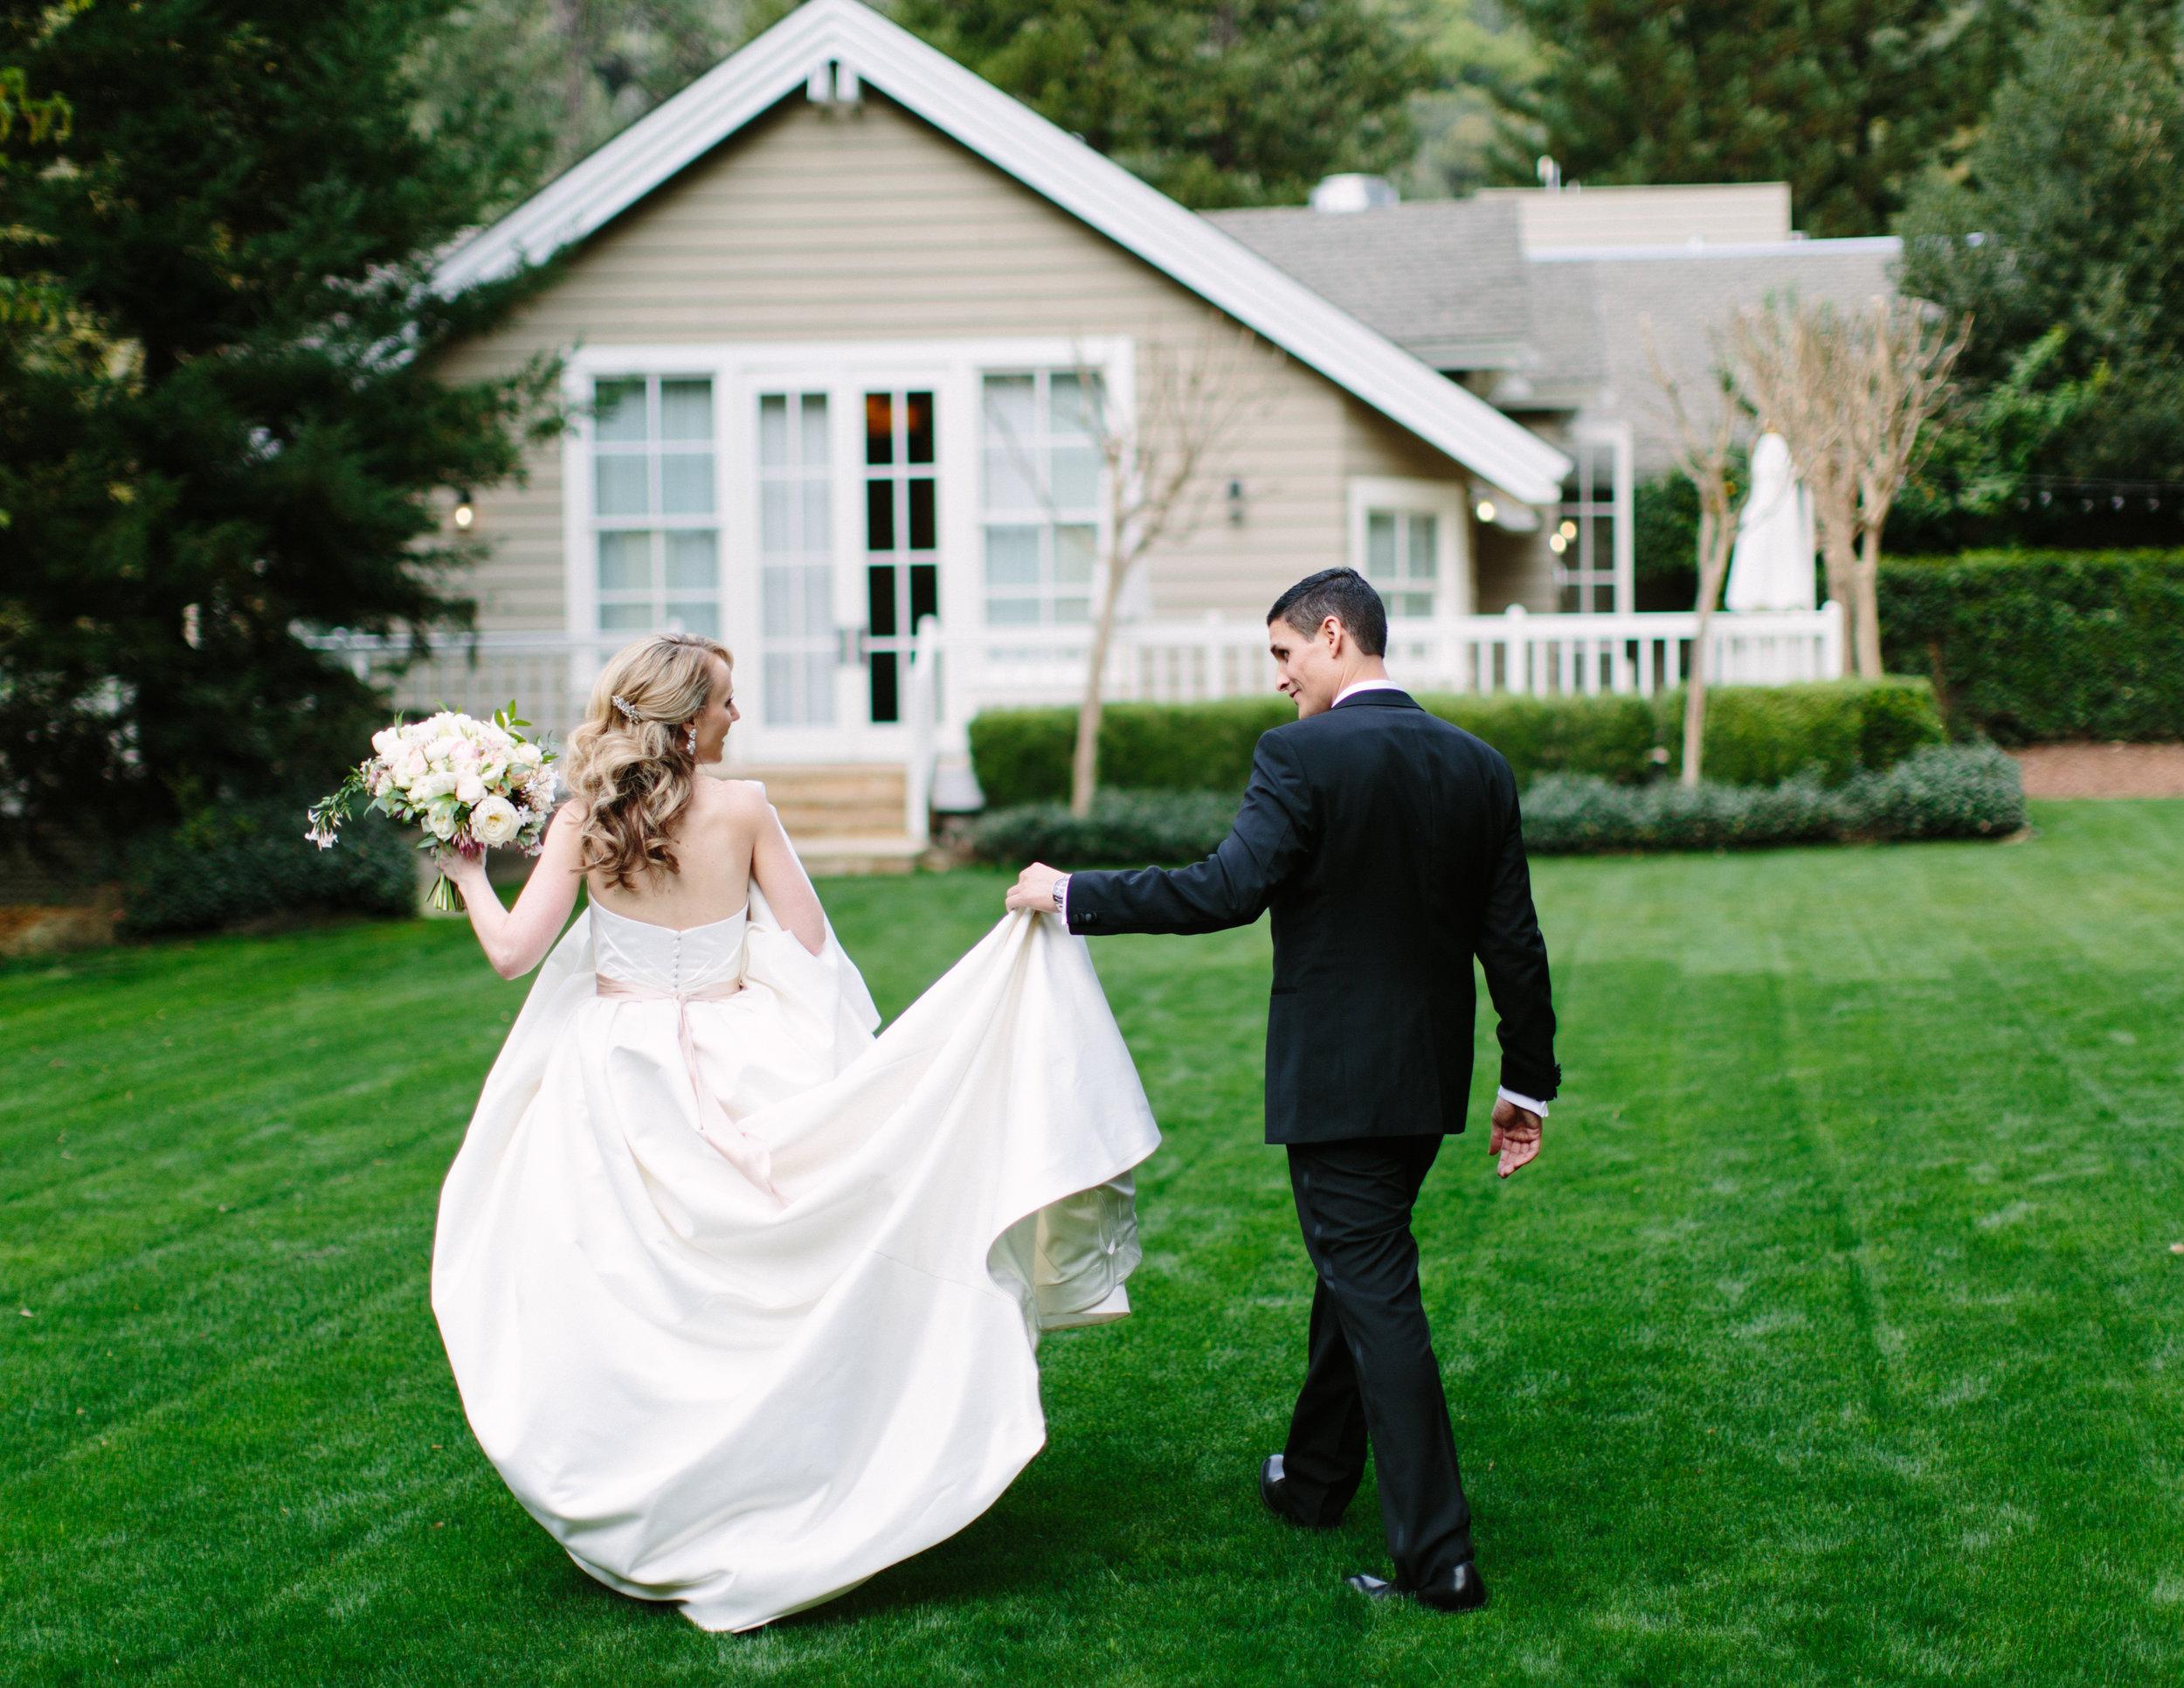 napa valley intimate wedding 6.jpg